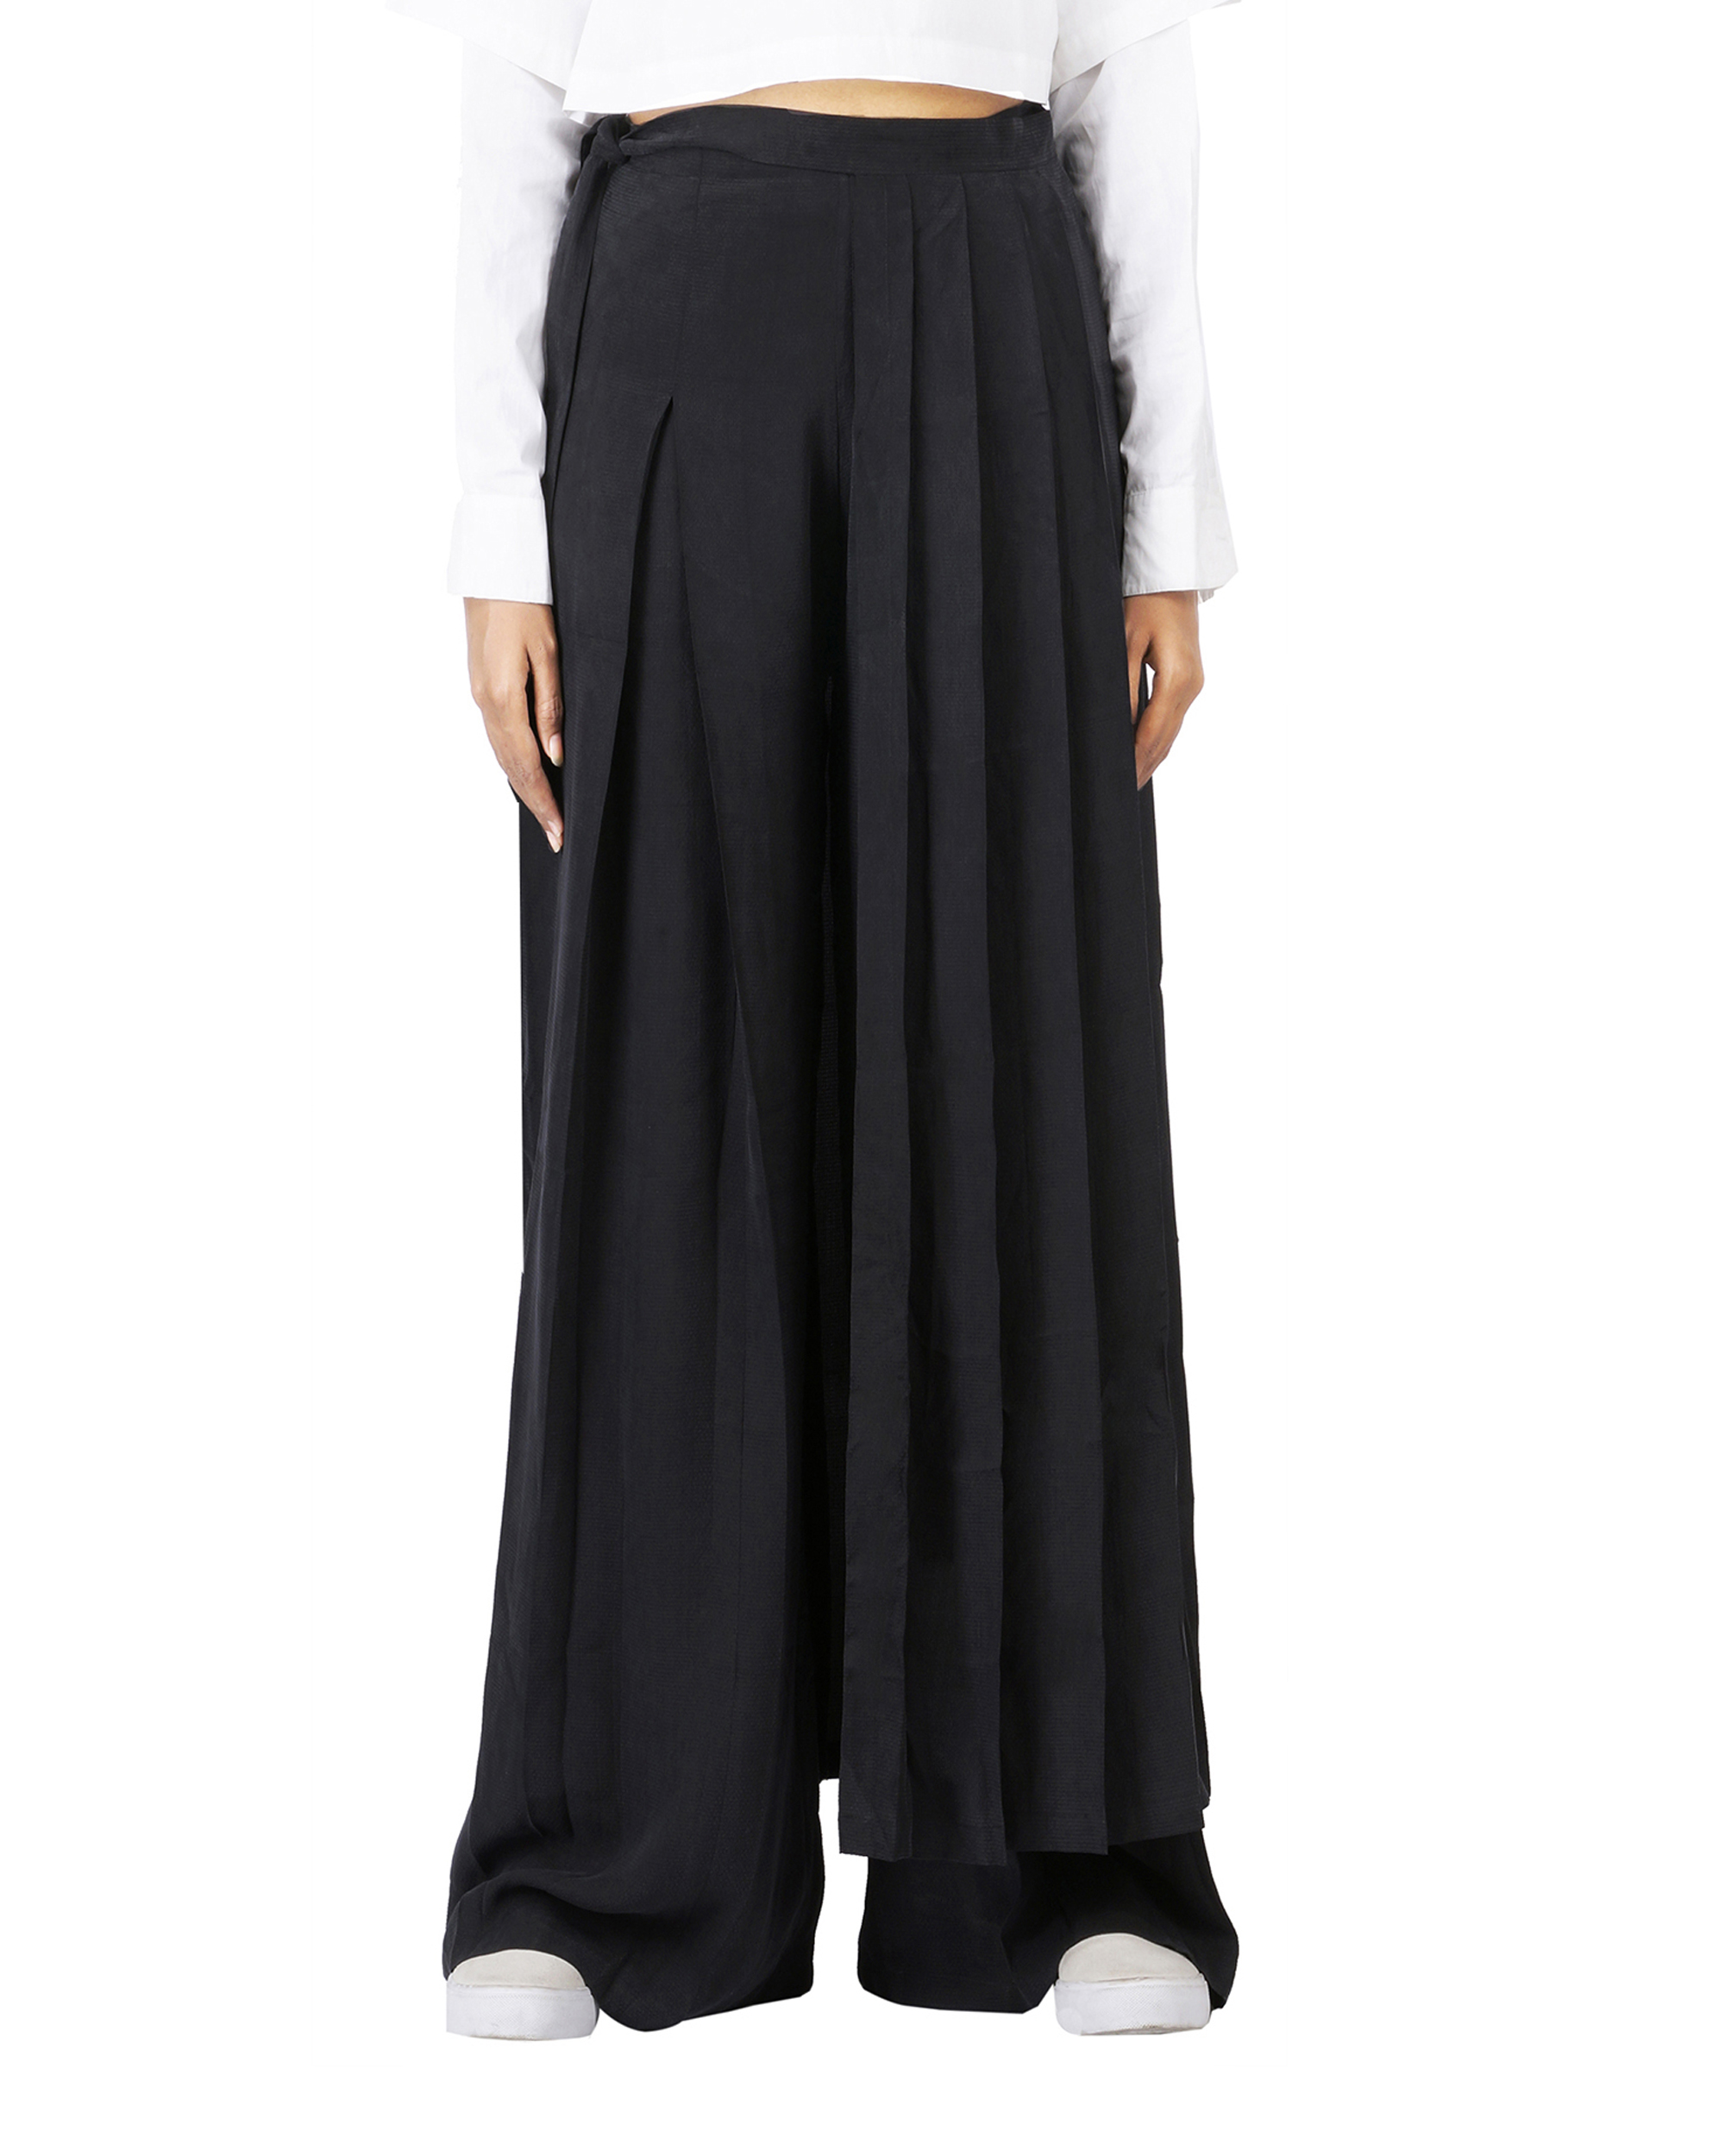 55db01228437c8 Black pleated wrap skirt by THREE | The Secret Label